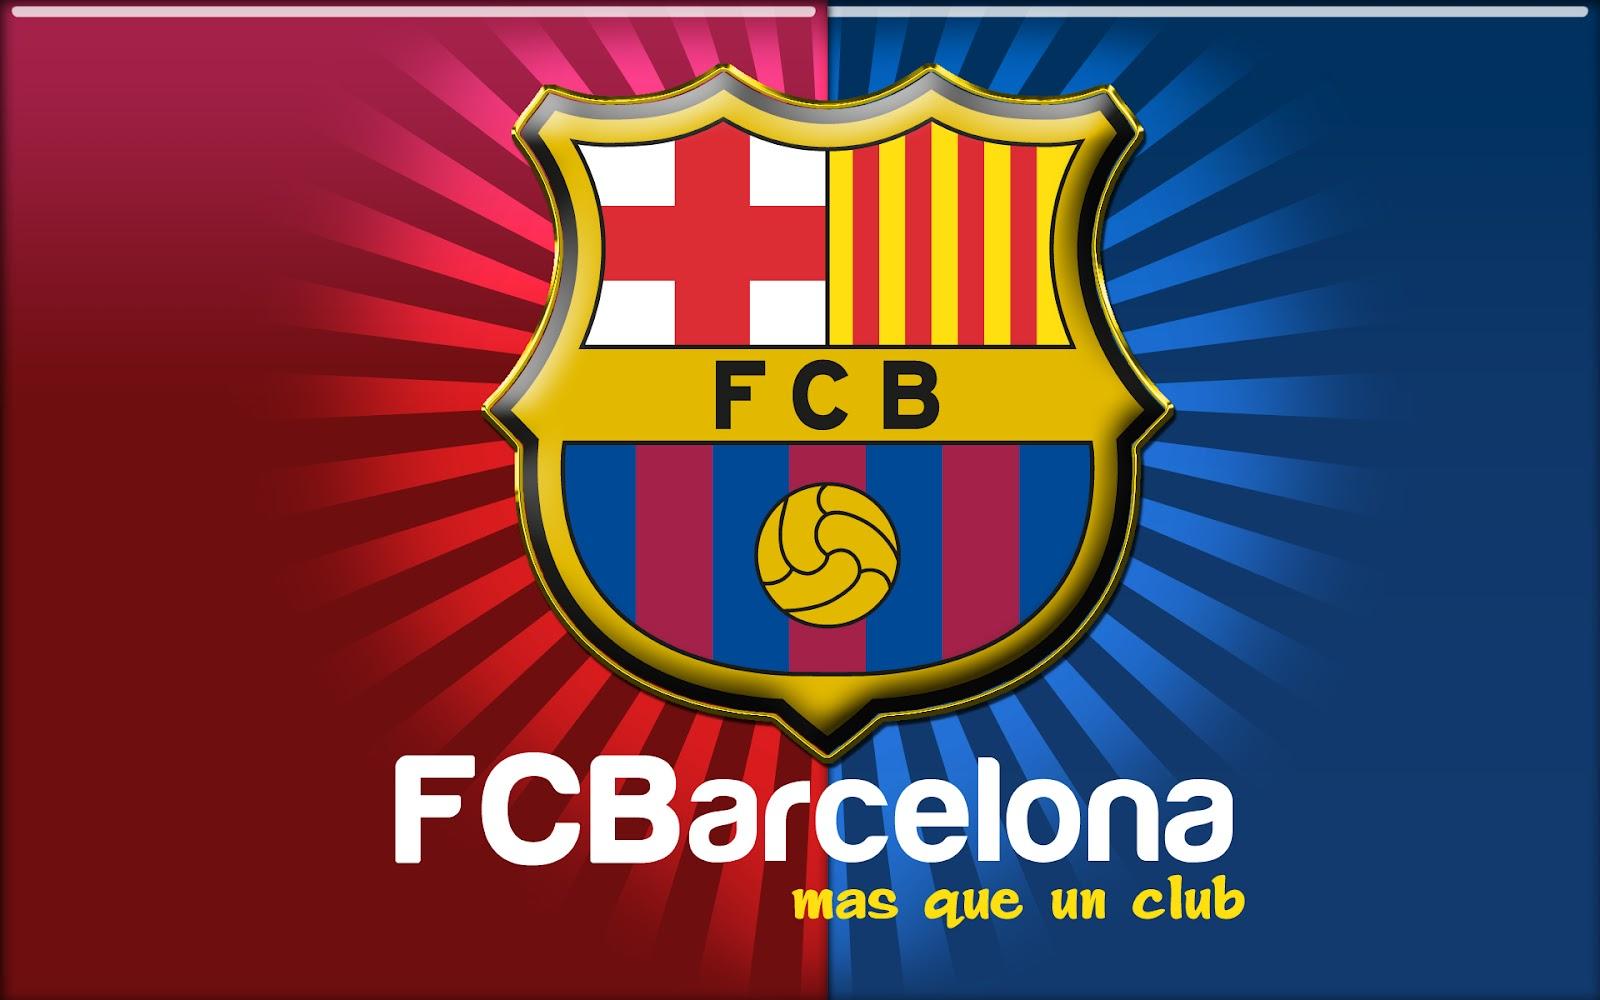 http://3.bp.blogspot.com/-7IX2AbKJ5ec/UBuONmljyEI/AAAAAAAASO8/MpvfVR4zjZo/s1600/fc-barcelona-logo_romania-megalitica.jpg